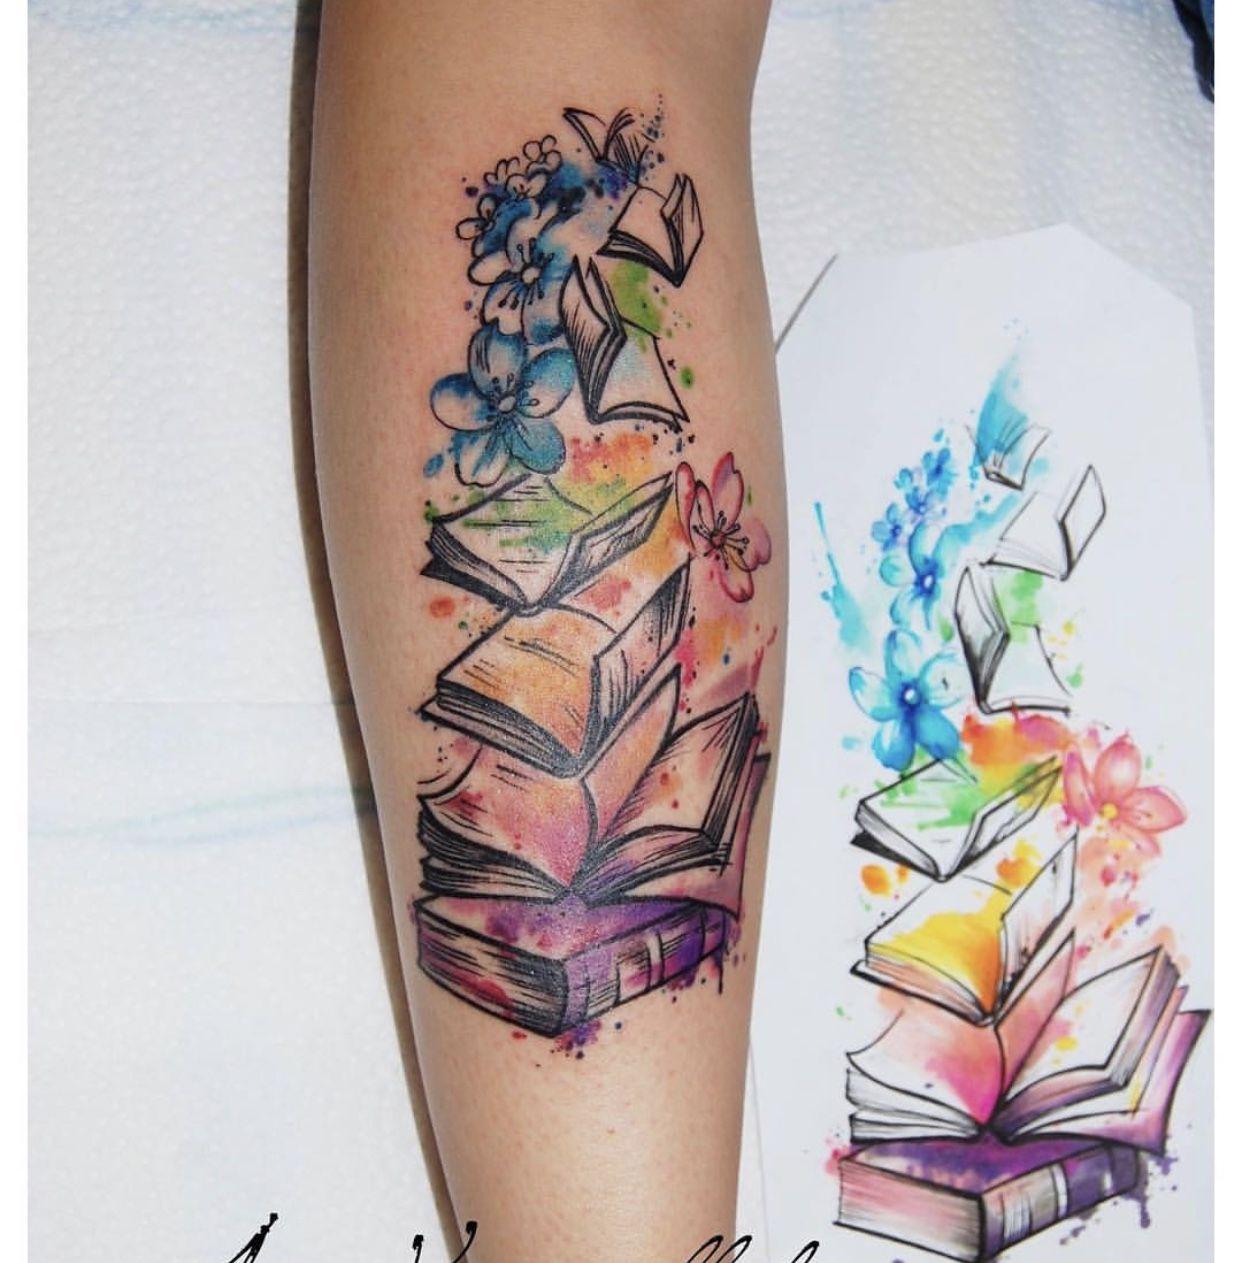 Colorful Books And Flowers Tattoo Tattooidea Bookish Tattoos Tattoos Beautiful Tattoos